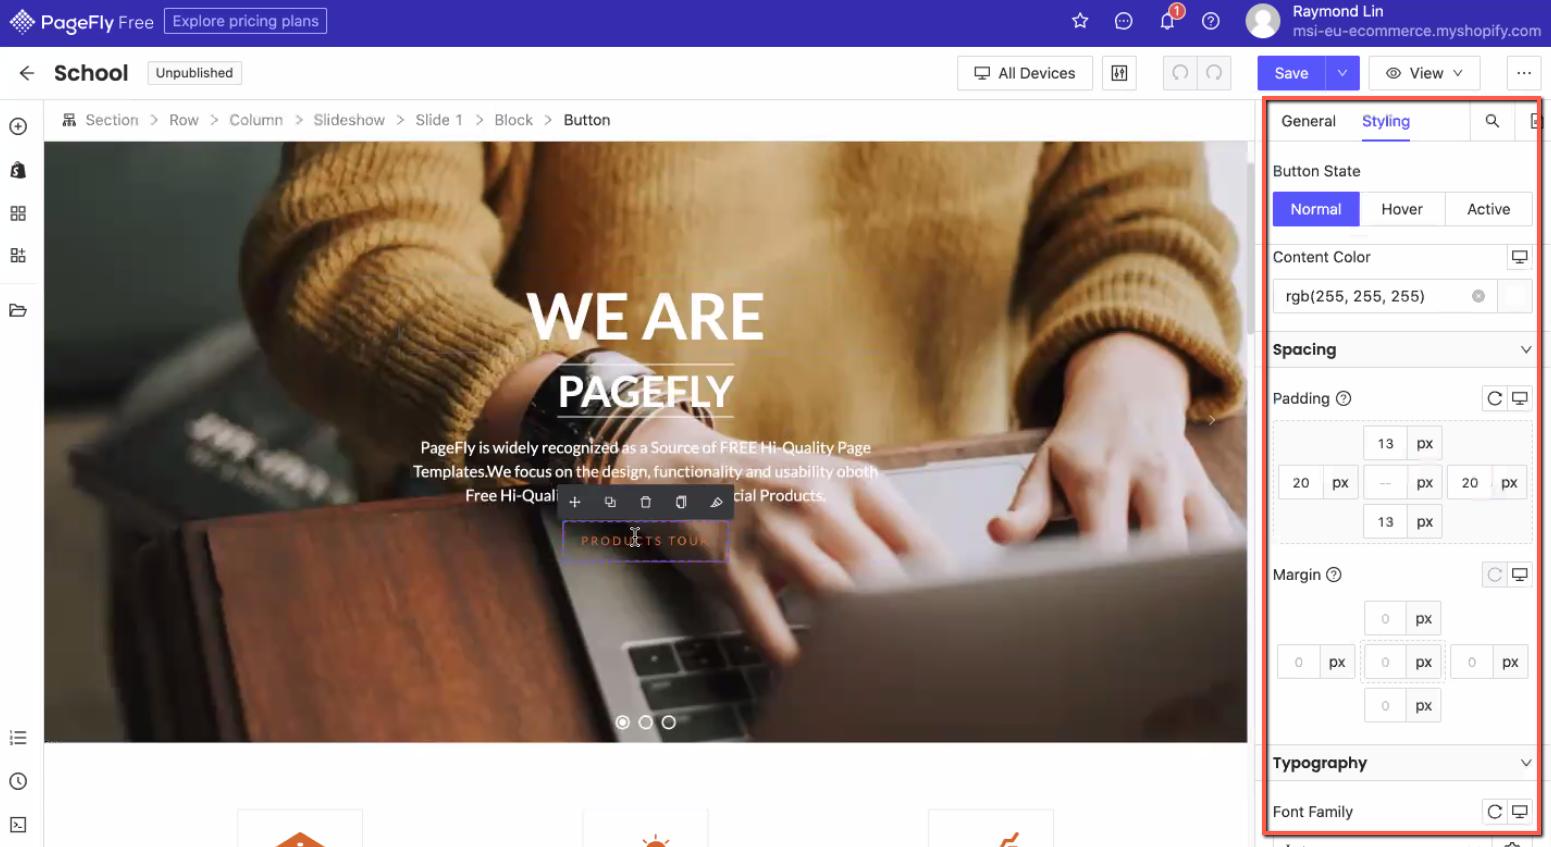 PageFly Element Customization and Styling Flexibility